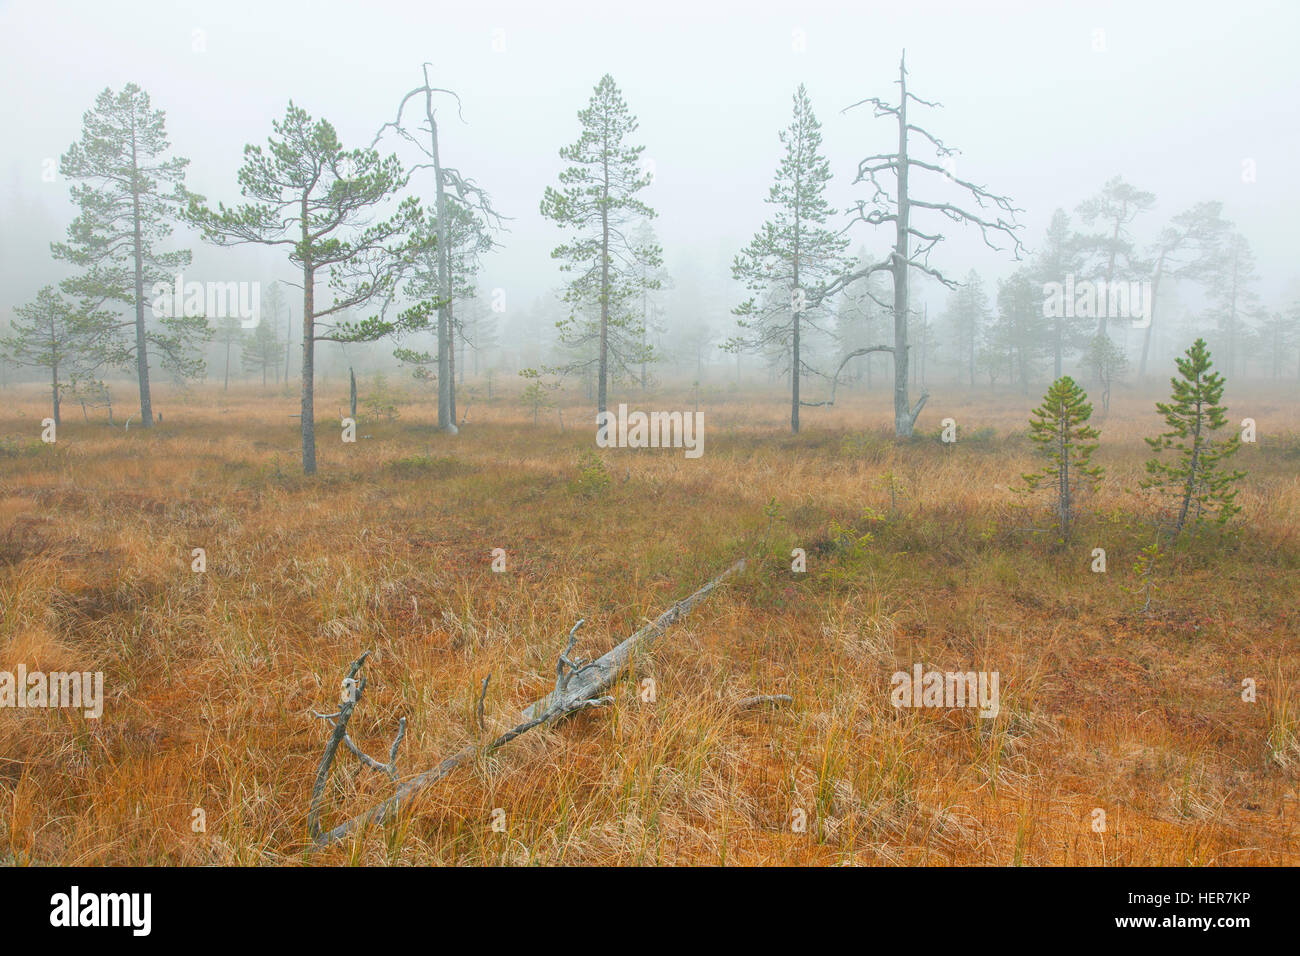 Old Scots pines (Pinus sylvestris) in moorland in the mist, Fulufjaellet / Fulufjället National Park, Älvdalen, - Stock Image